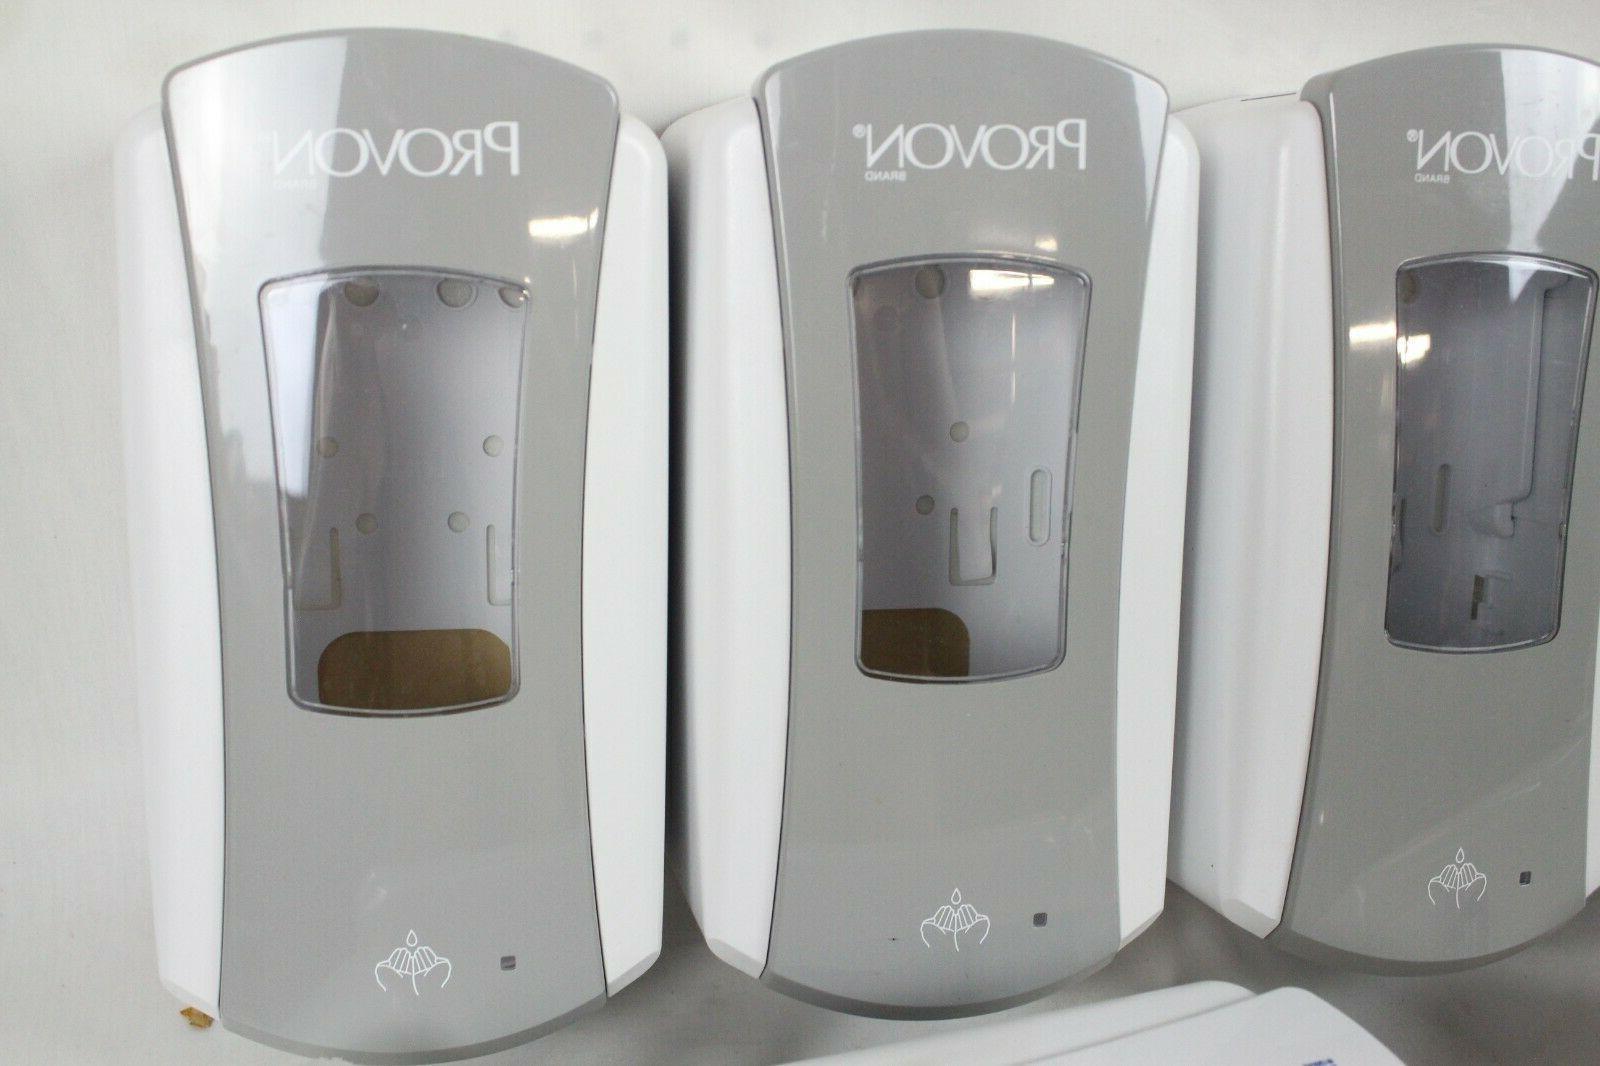 6 Provon Soap Sanitizer Lot 5 1 Used Bathroom